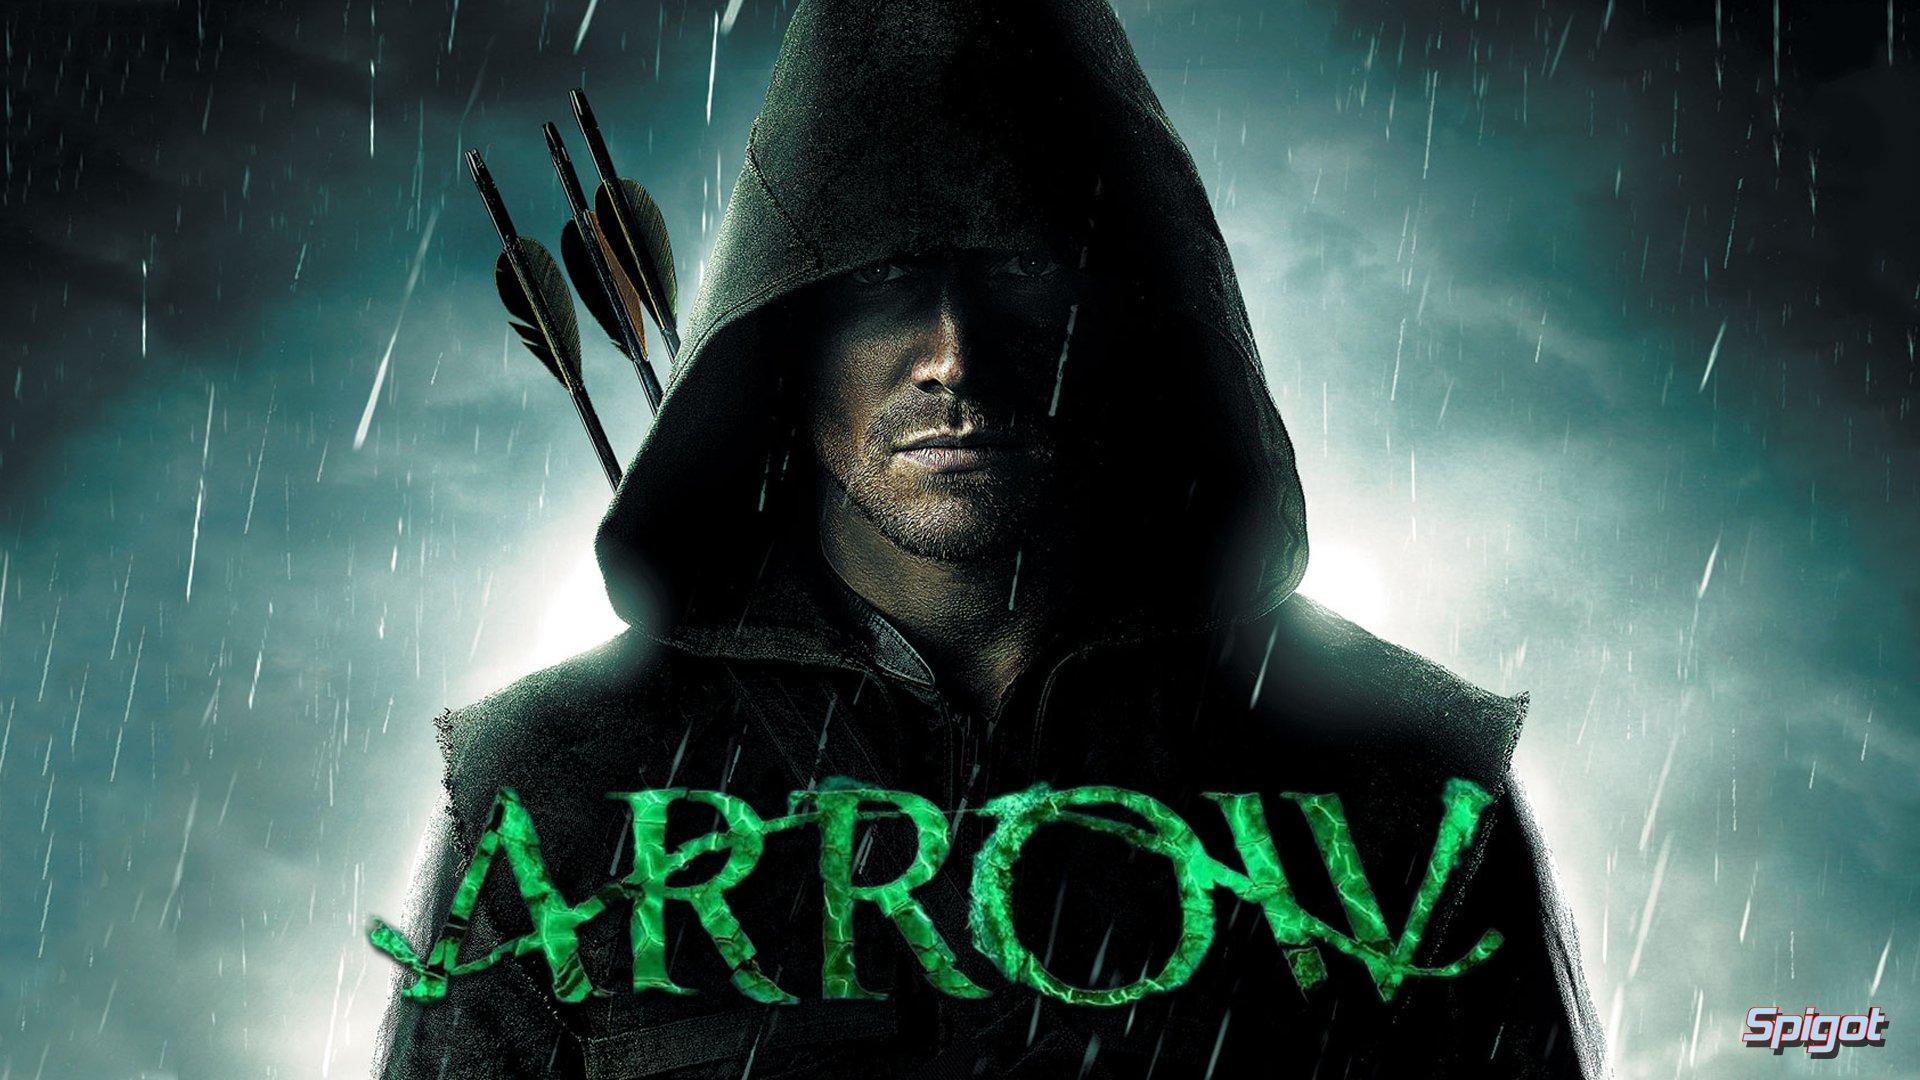 crime television series poster warrior archer wallpaper background 1920x1080